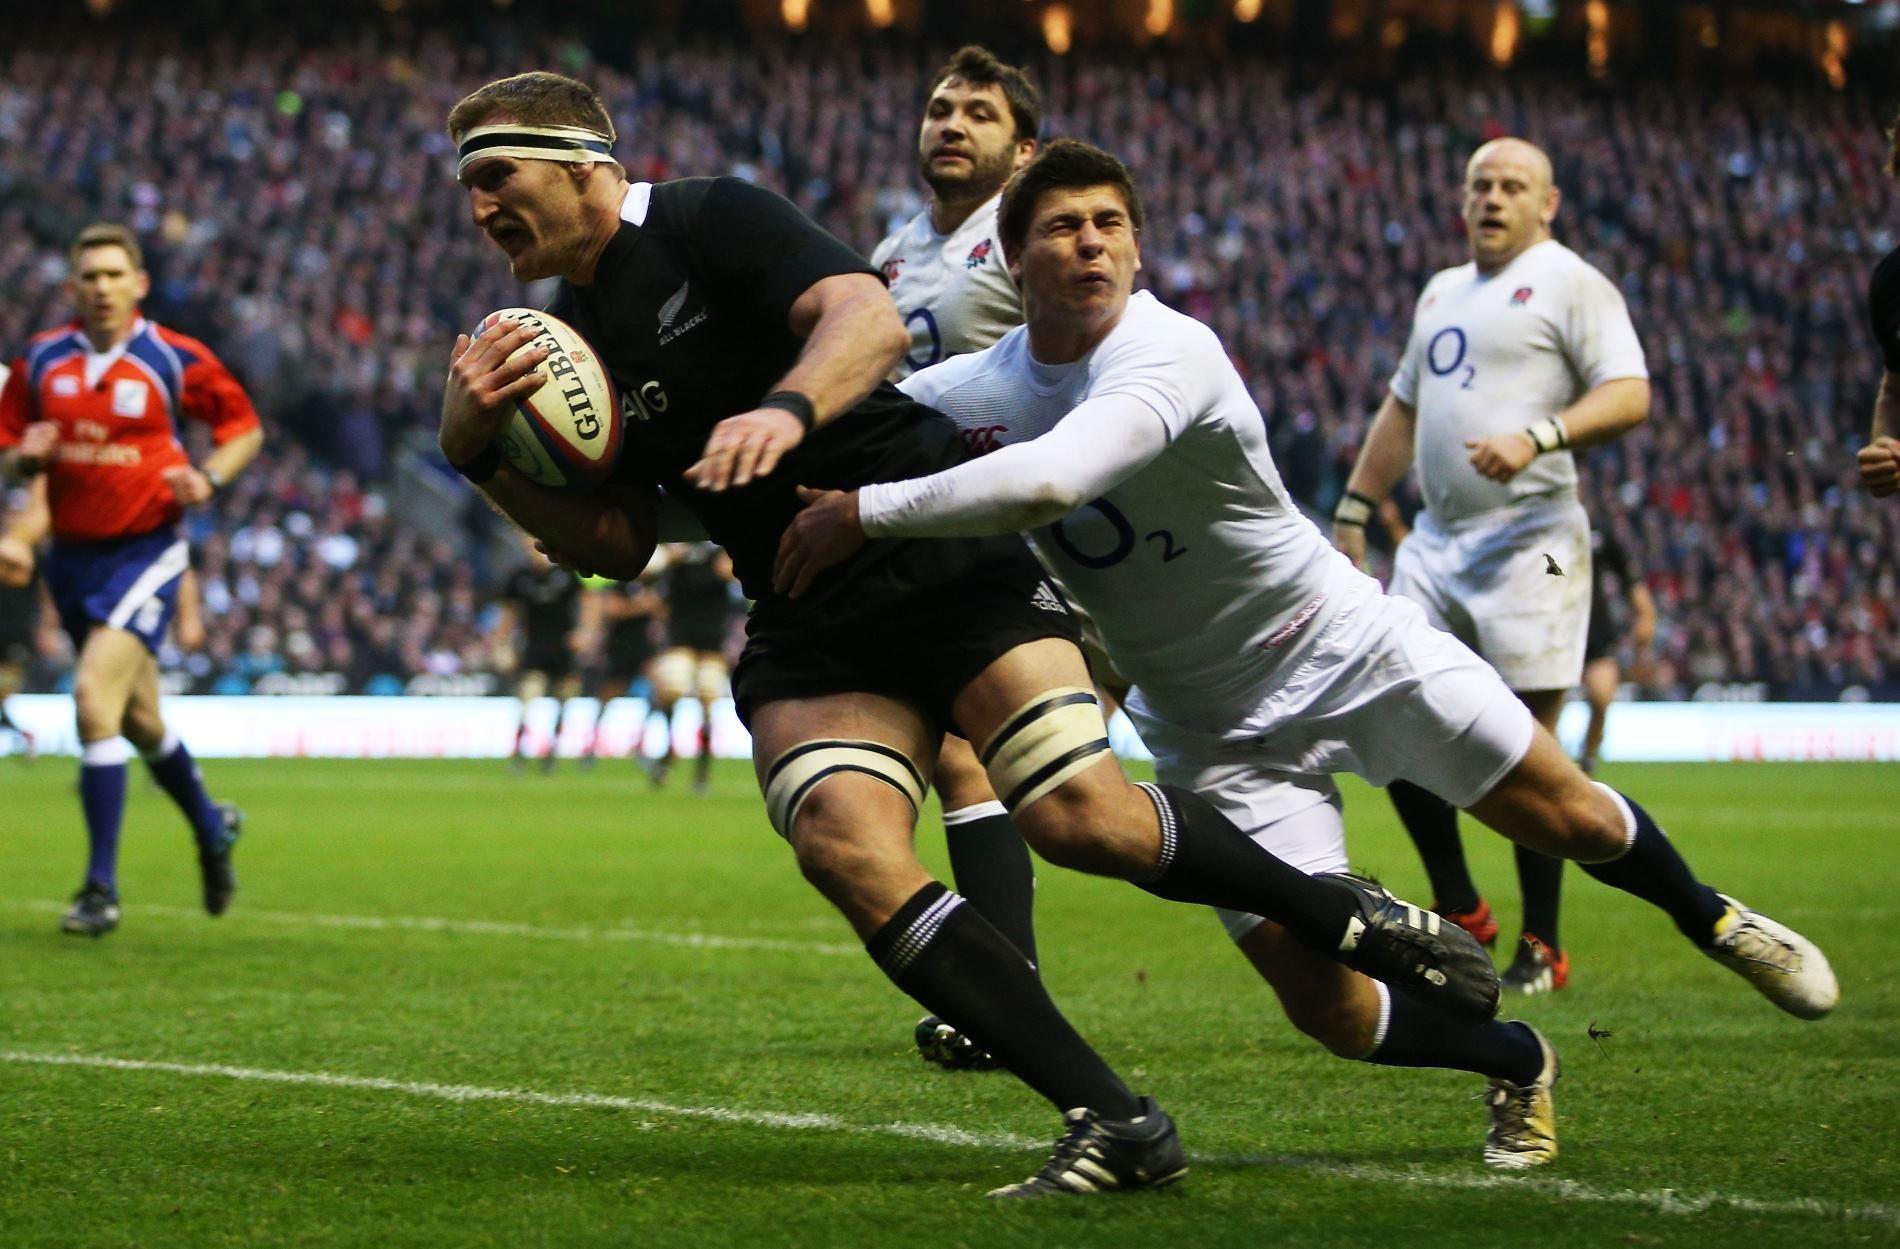 fond d'ecran gratuit rugby